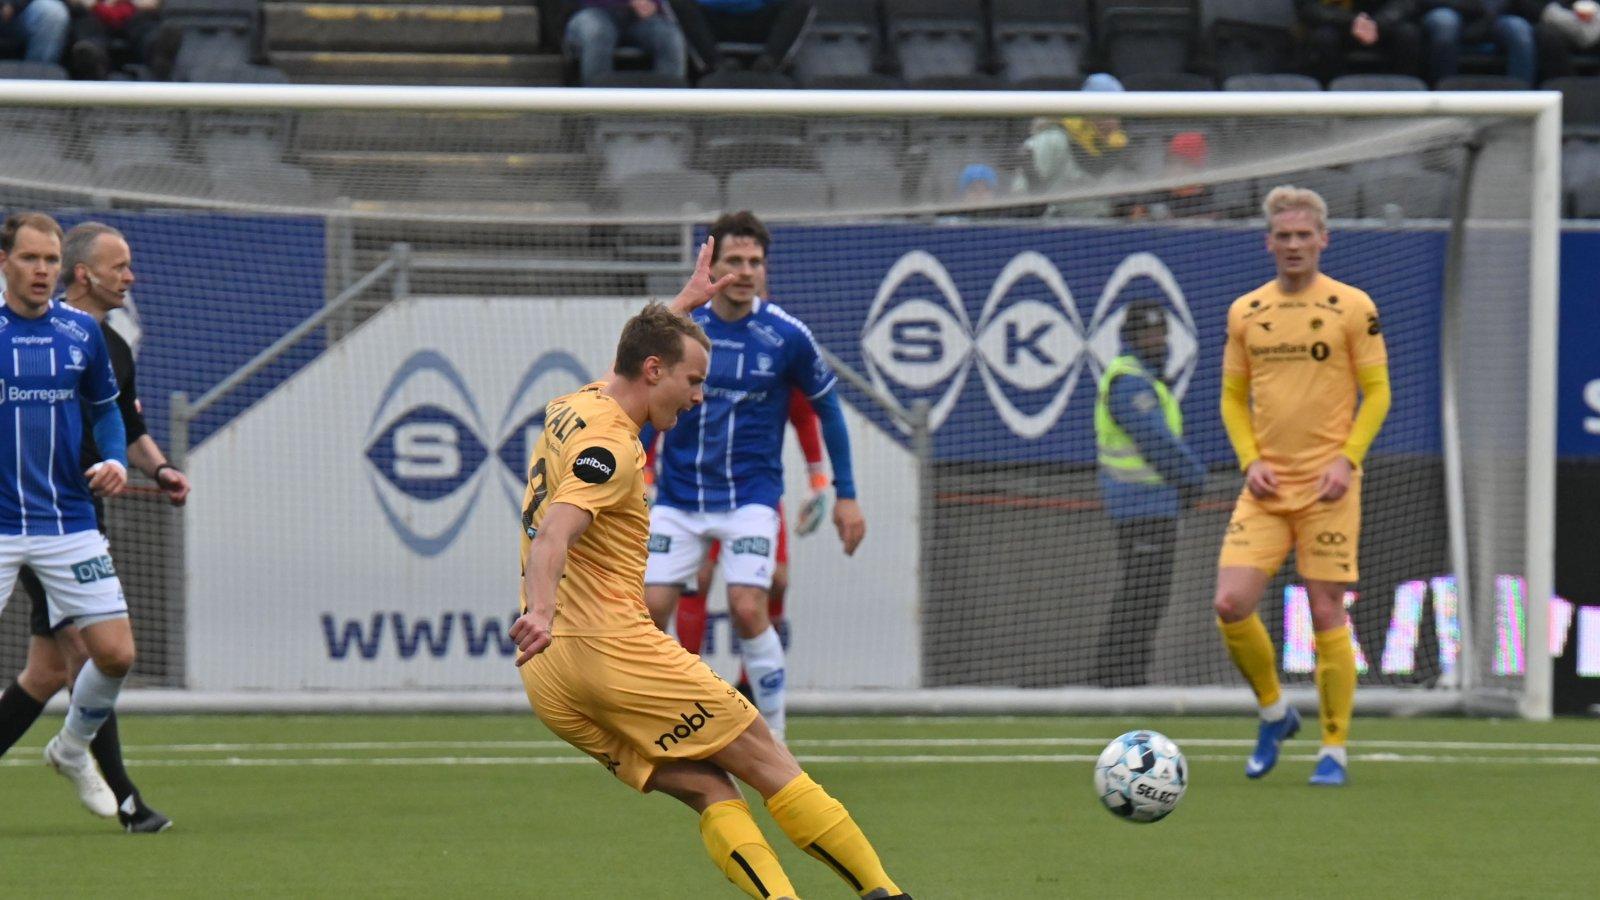 Marius Lode i kampen mot Sarpsborg 08 på Aspmyra i 2019.